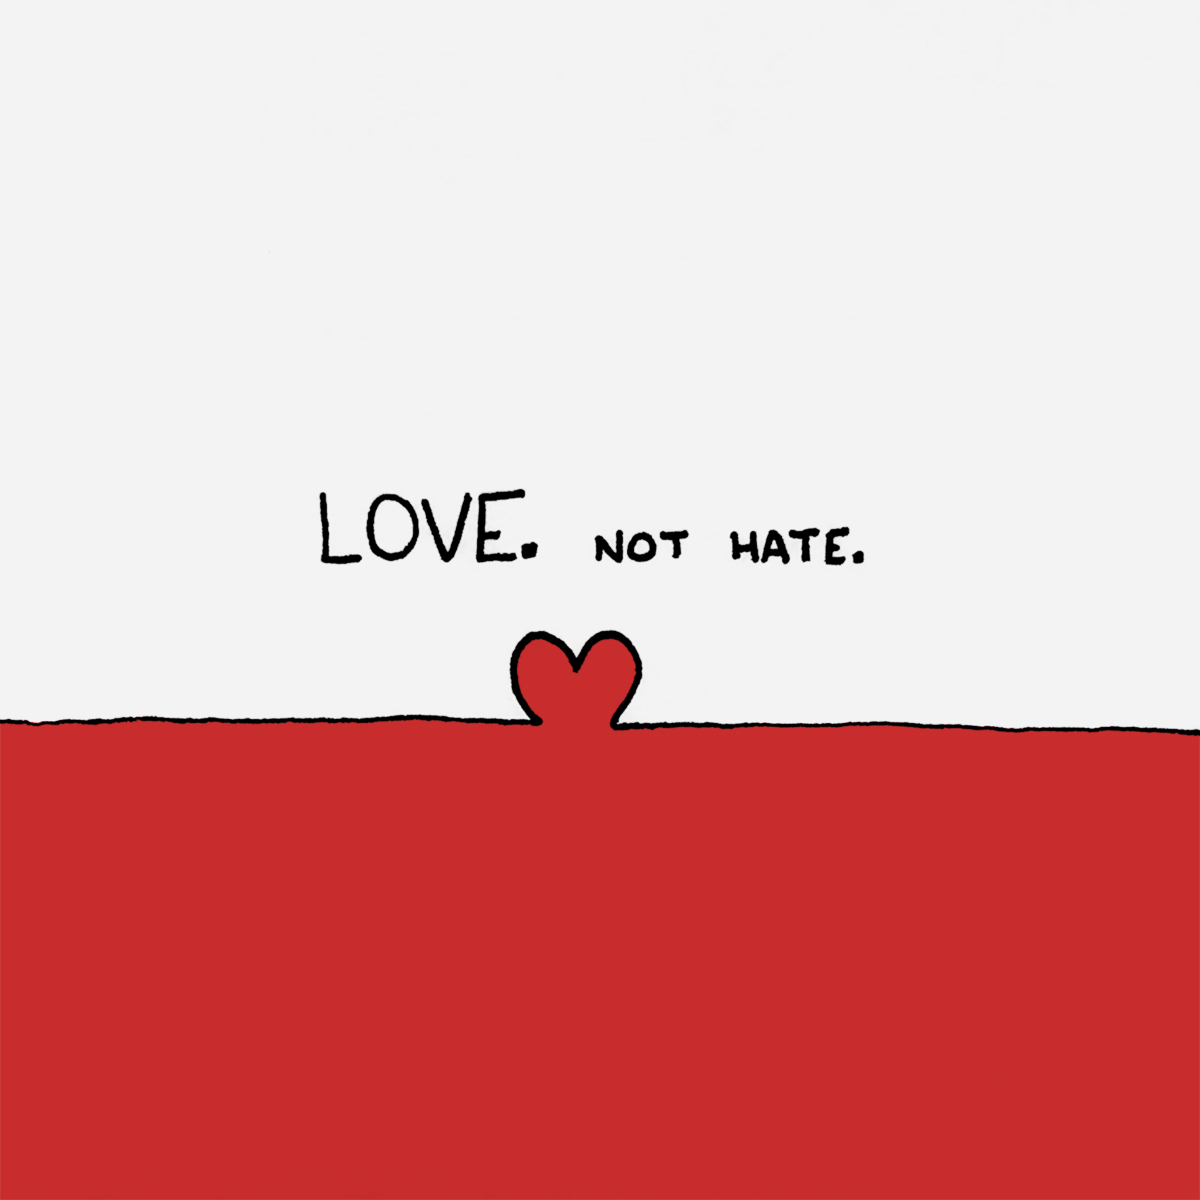 Love not hate.jpg